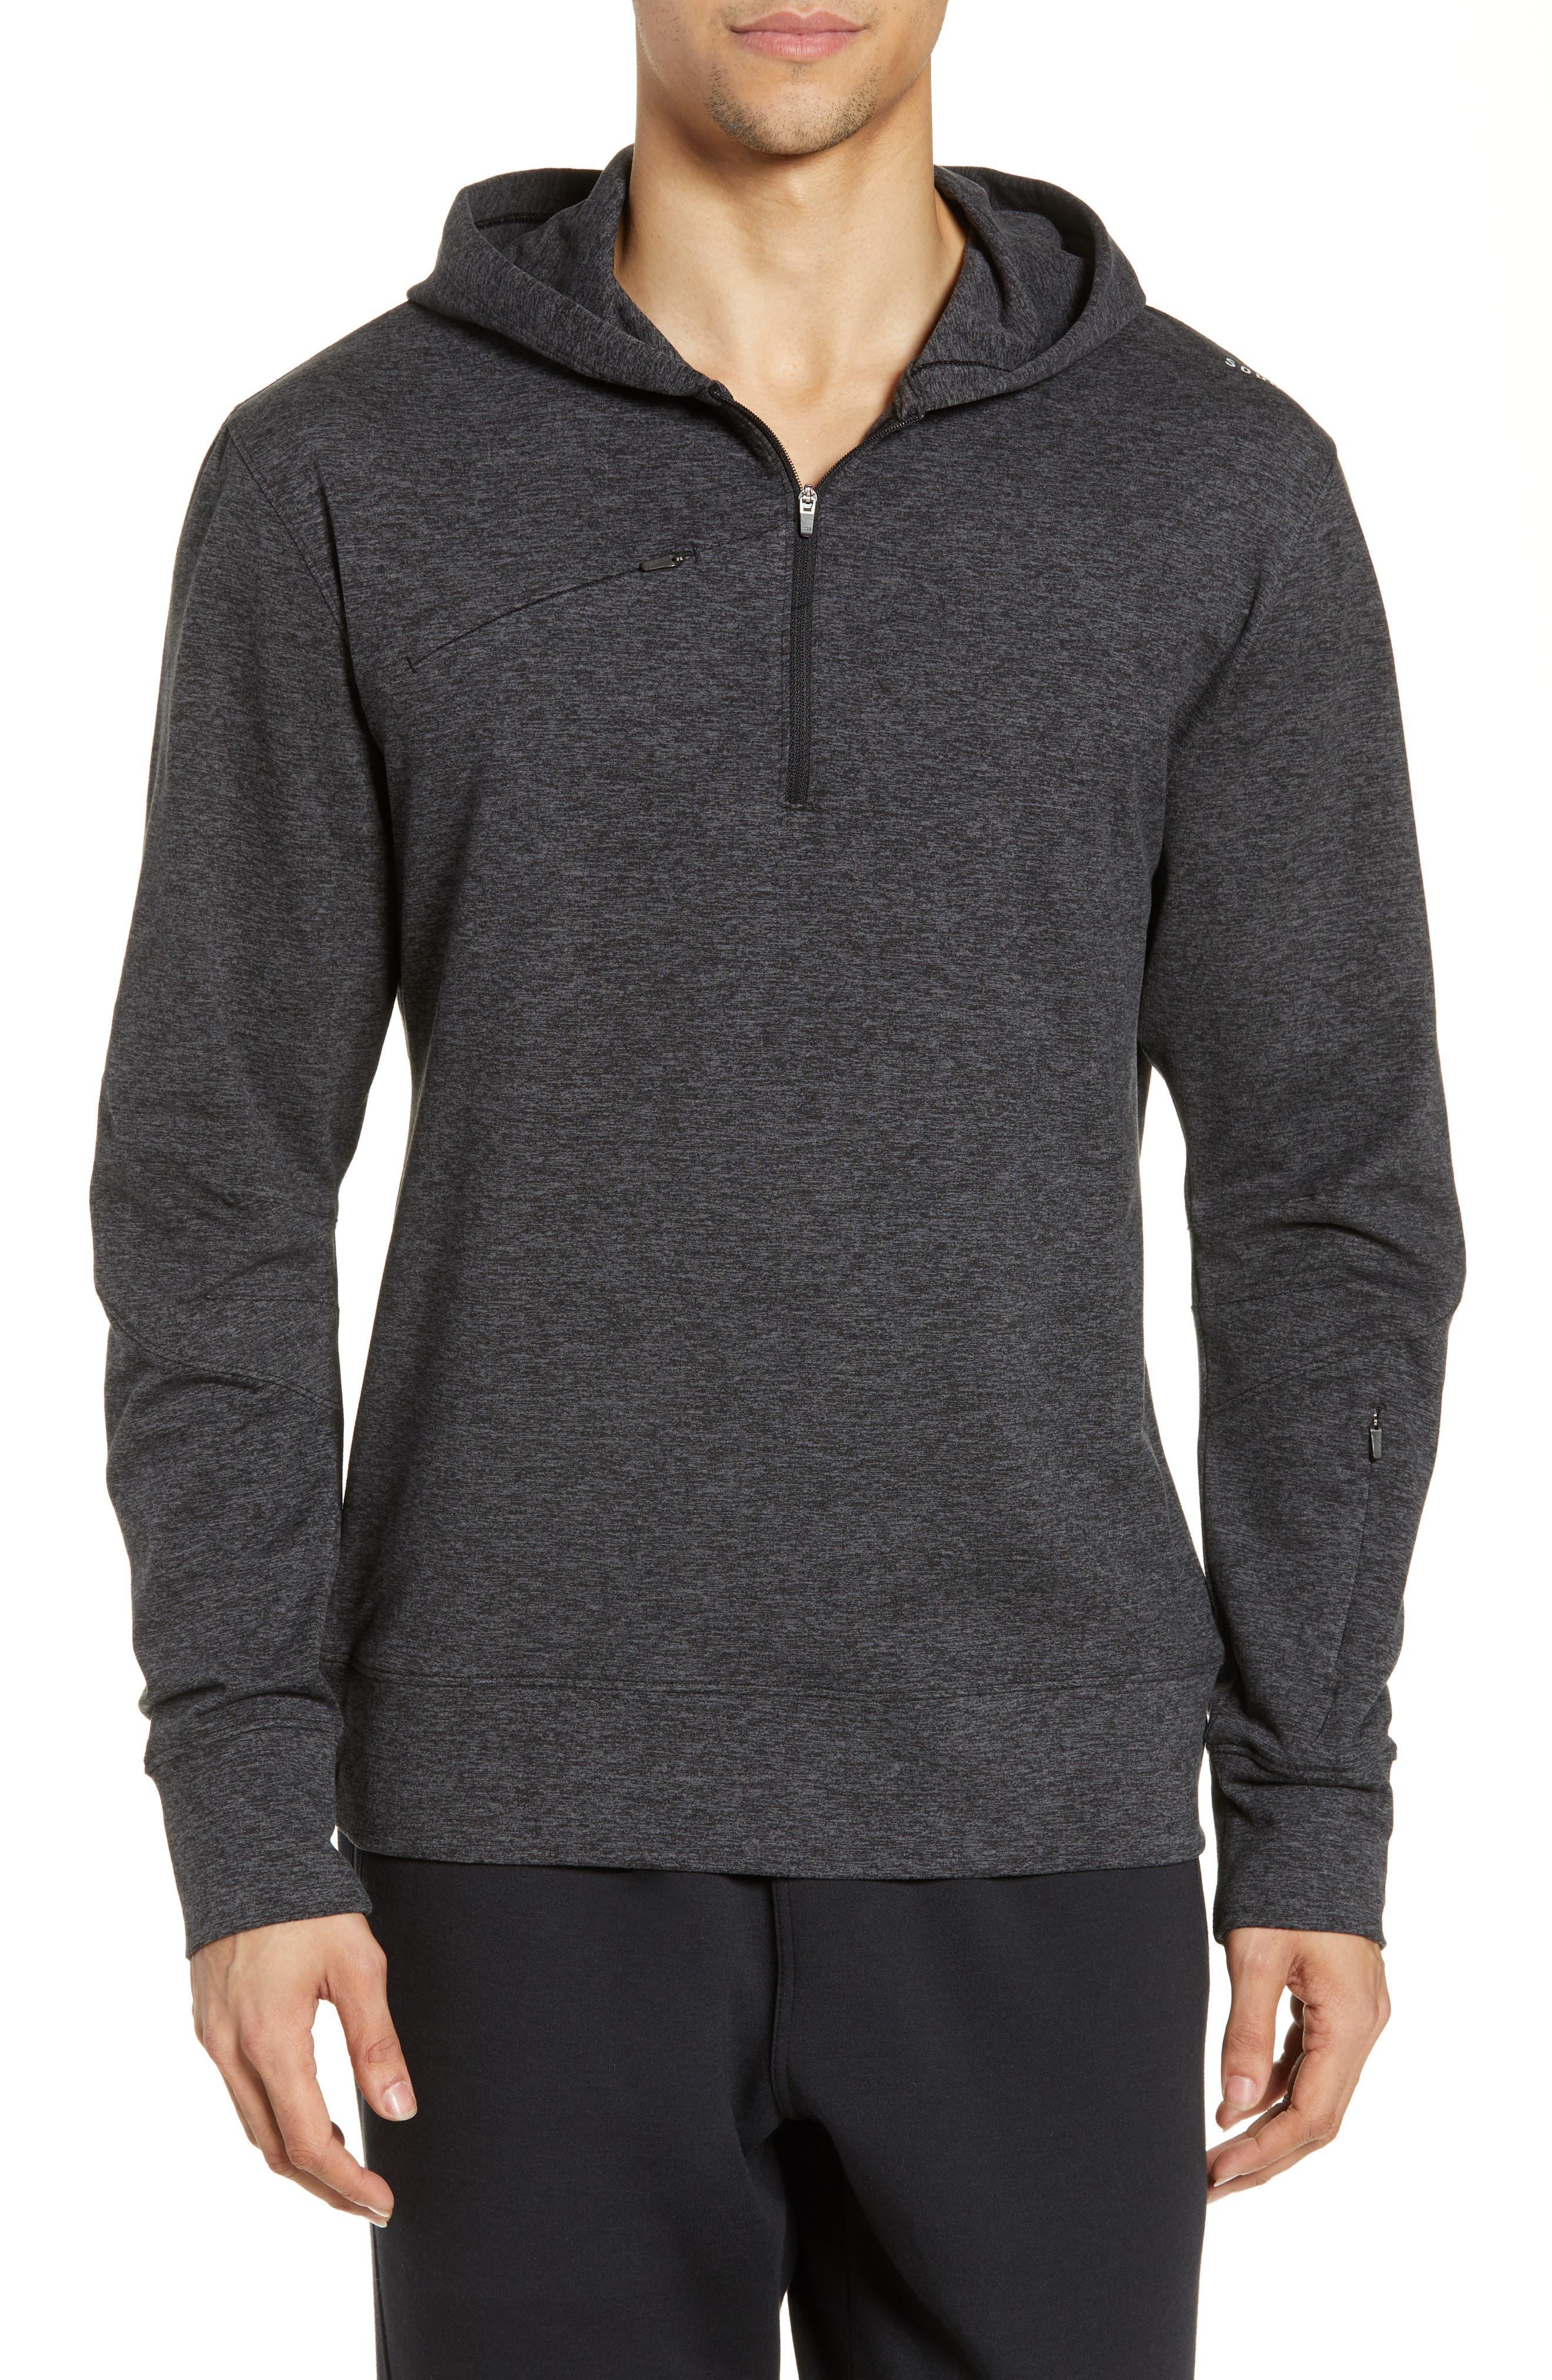 SODO, Elevate Hooded Sweatshirt, Main thumbnail 1, color, HEATHER CHARCOAL BLACK/ BLACK